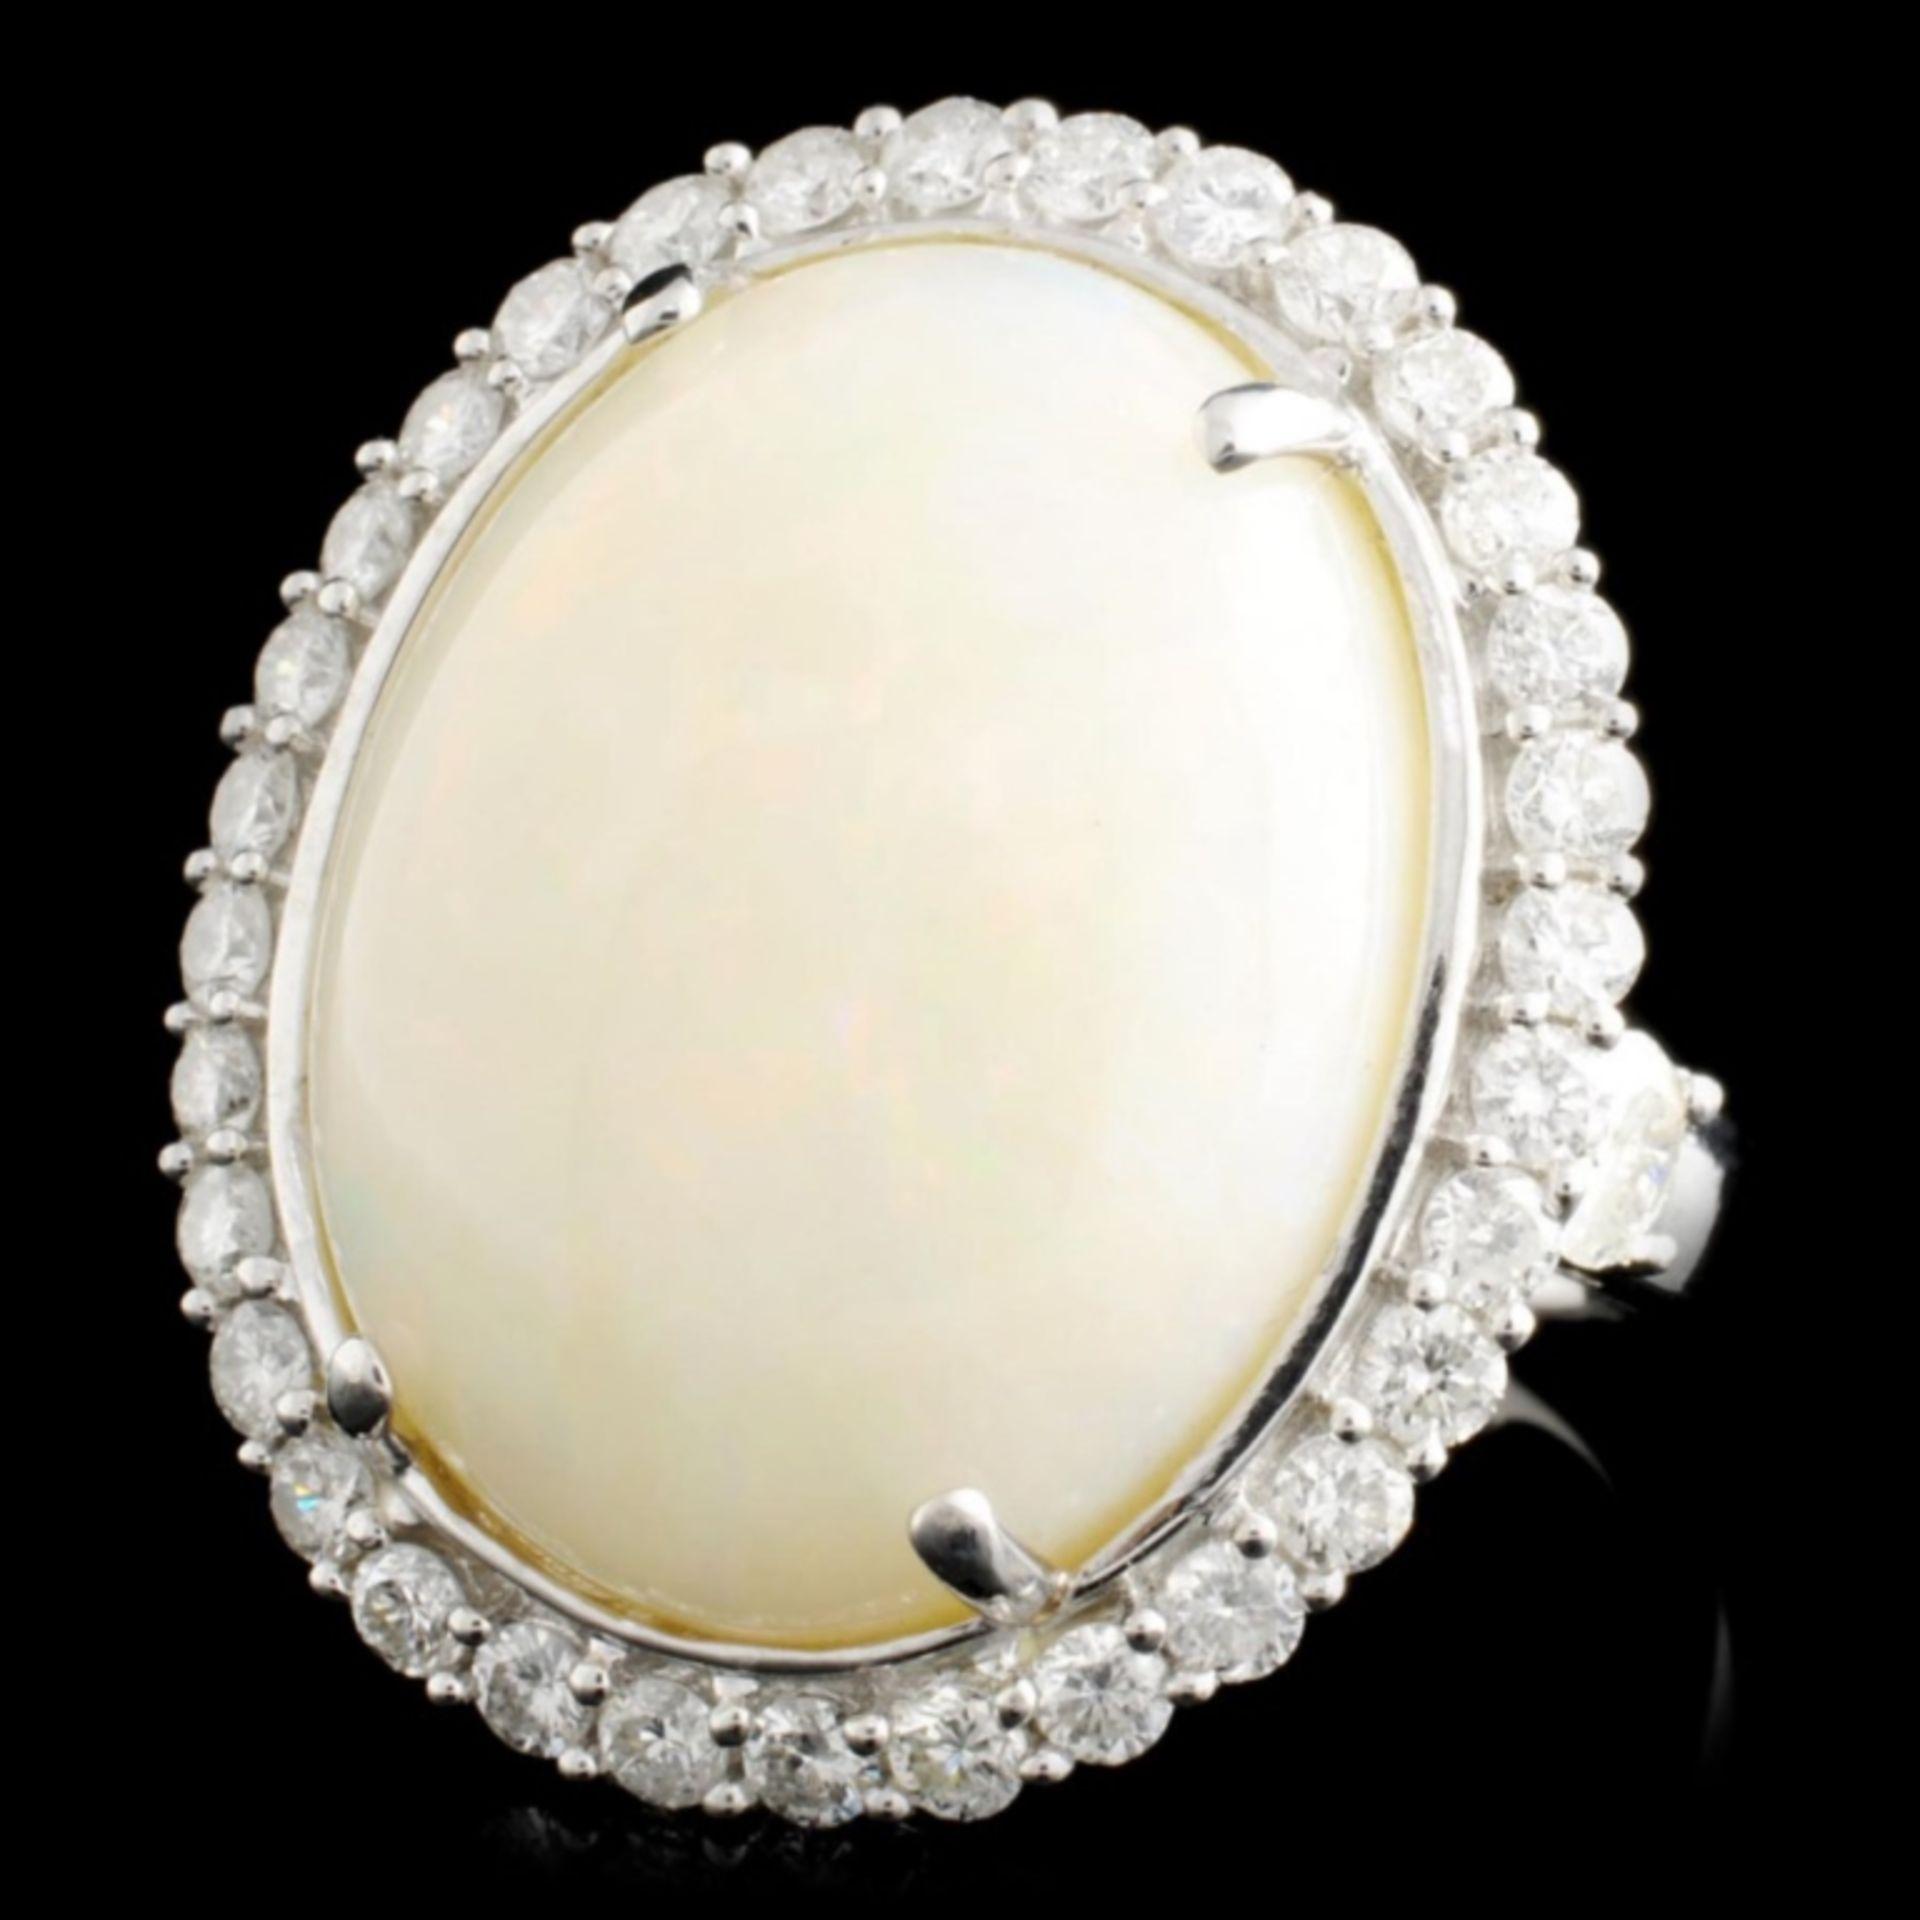 14K Gold 13.31ct Opal & 1.45ctw Diamond Ring - Image 2 of 3